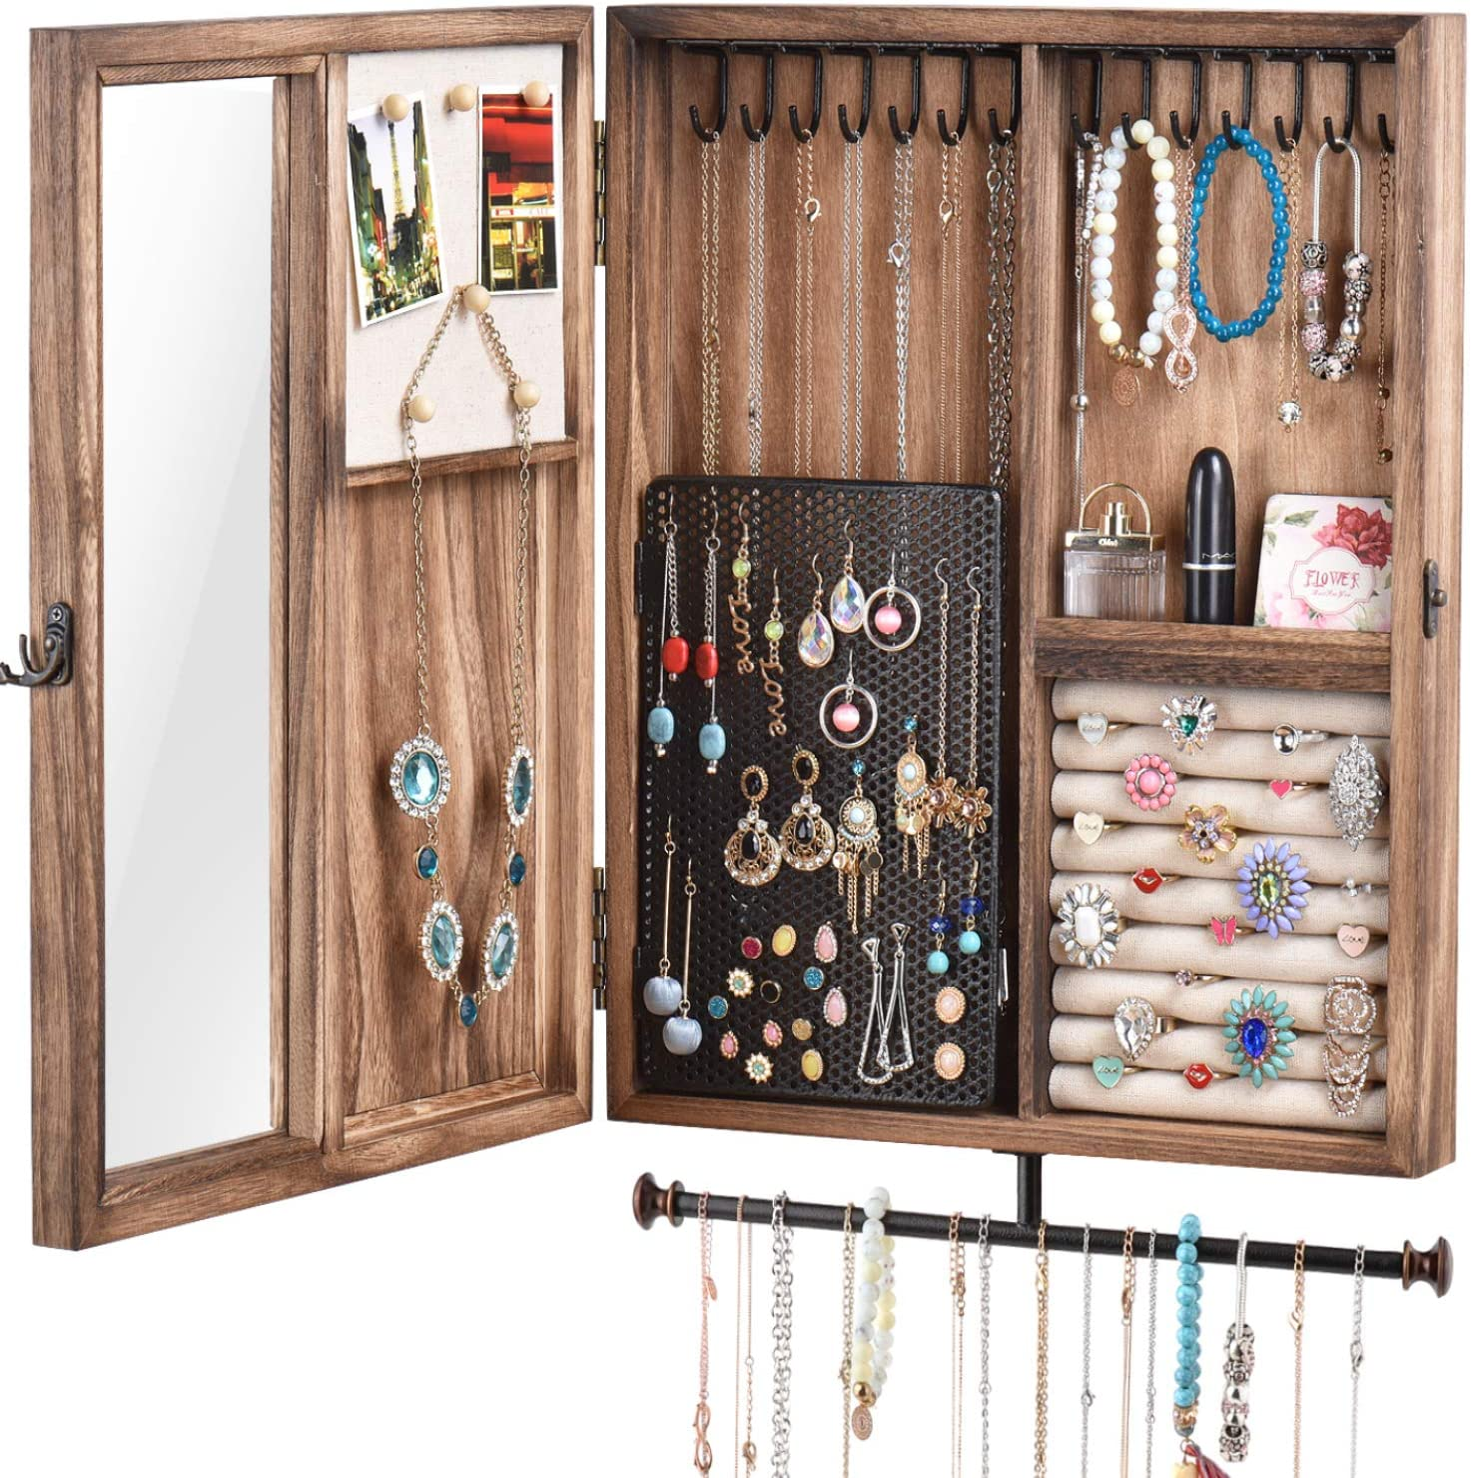 Buy Keebofly Wall Mounted Jewelry Organizer Box Rustic Wood Large ...